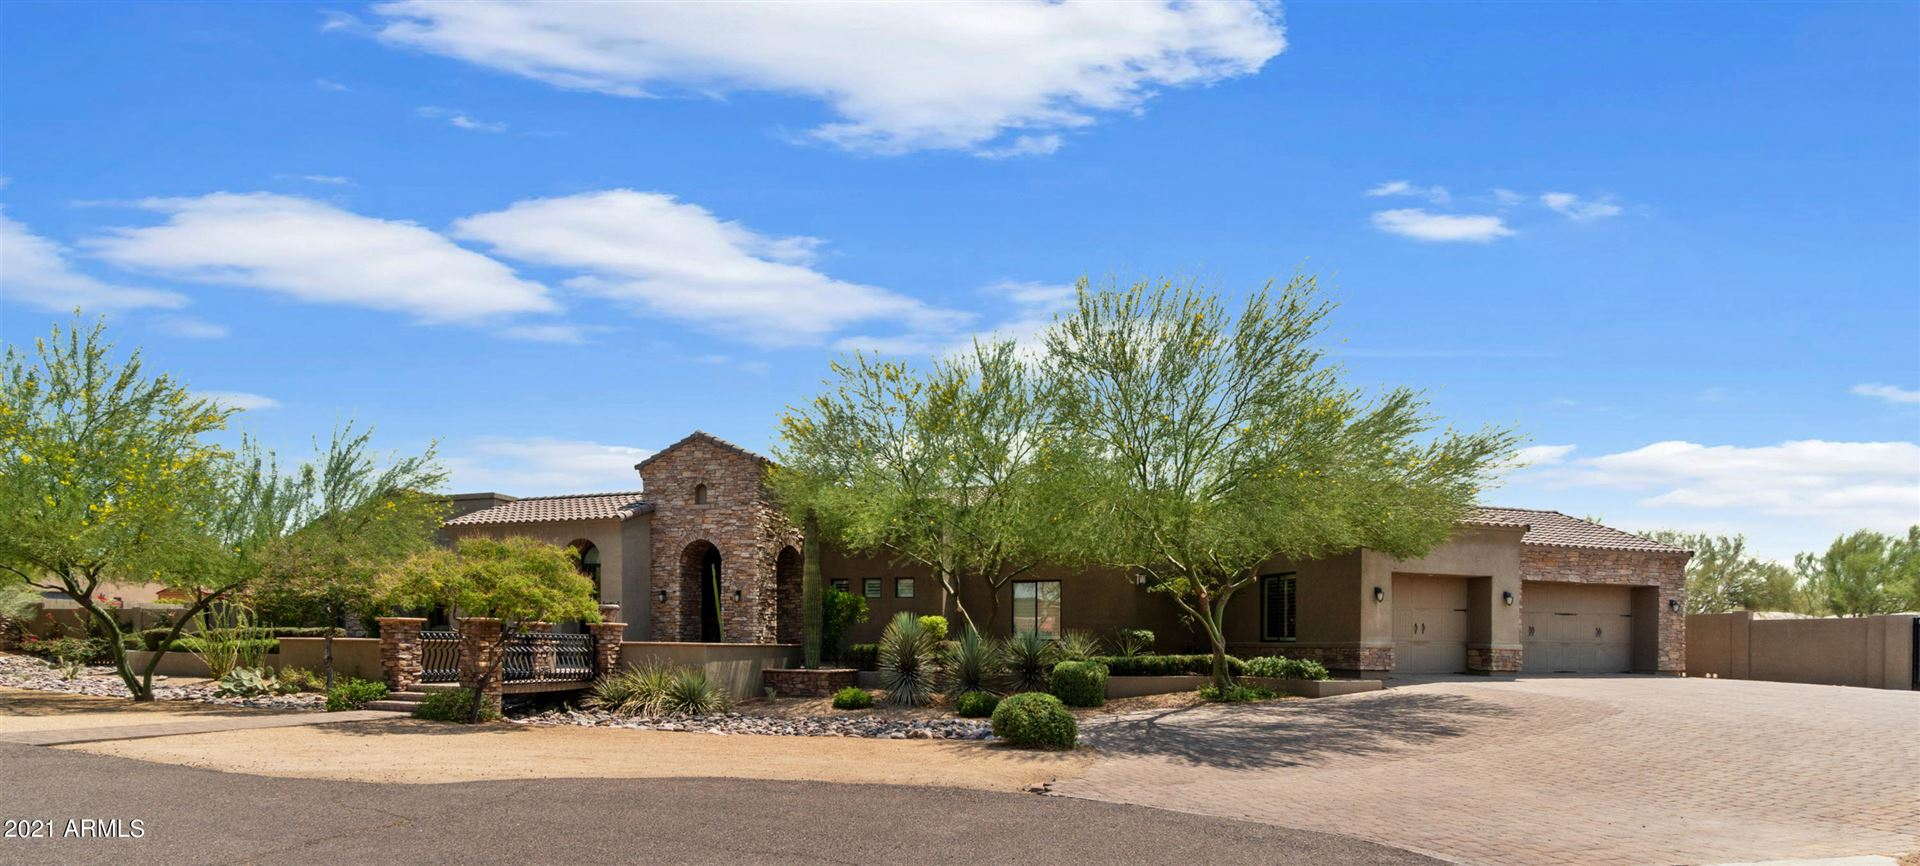 31225 N 57TH Place, Cave Creek, AZ 85331 - MLS#: 6213519